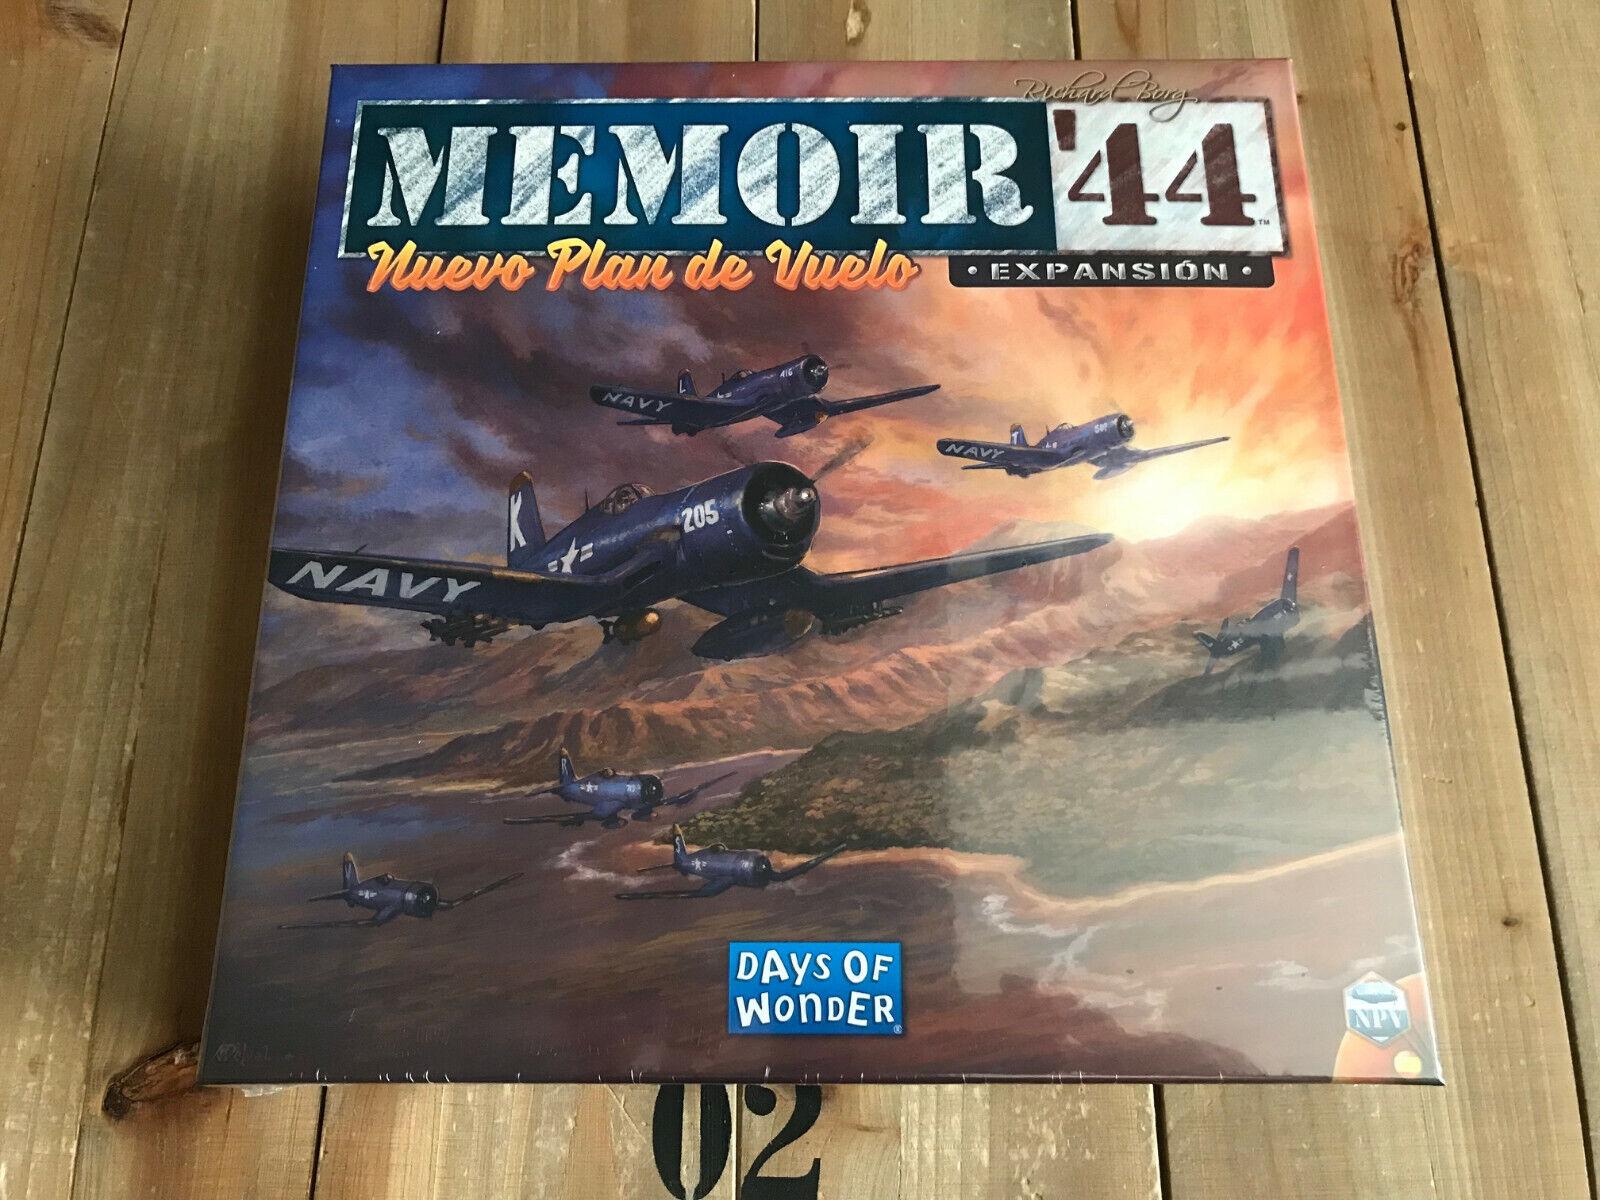 Juego wargame - Memoir ´44 Nuevo Plan de Vuelo - EDGE - DAYS OF WONDER - WWII